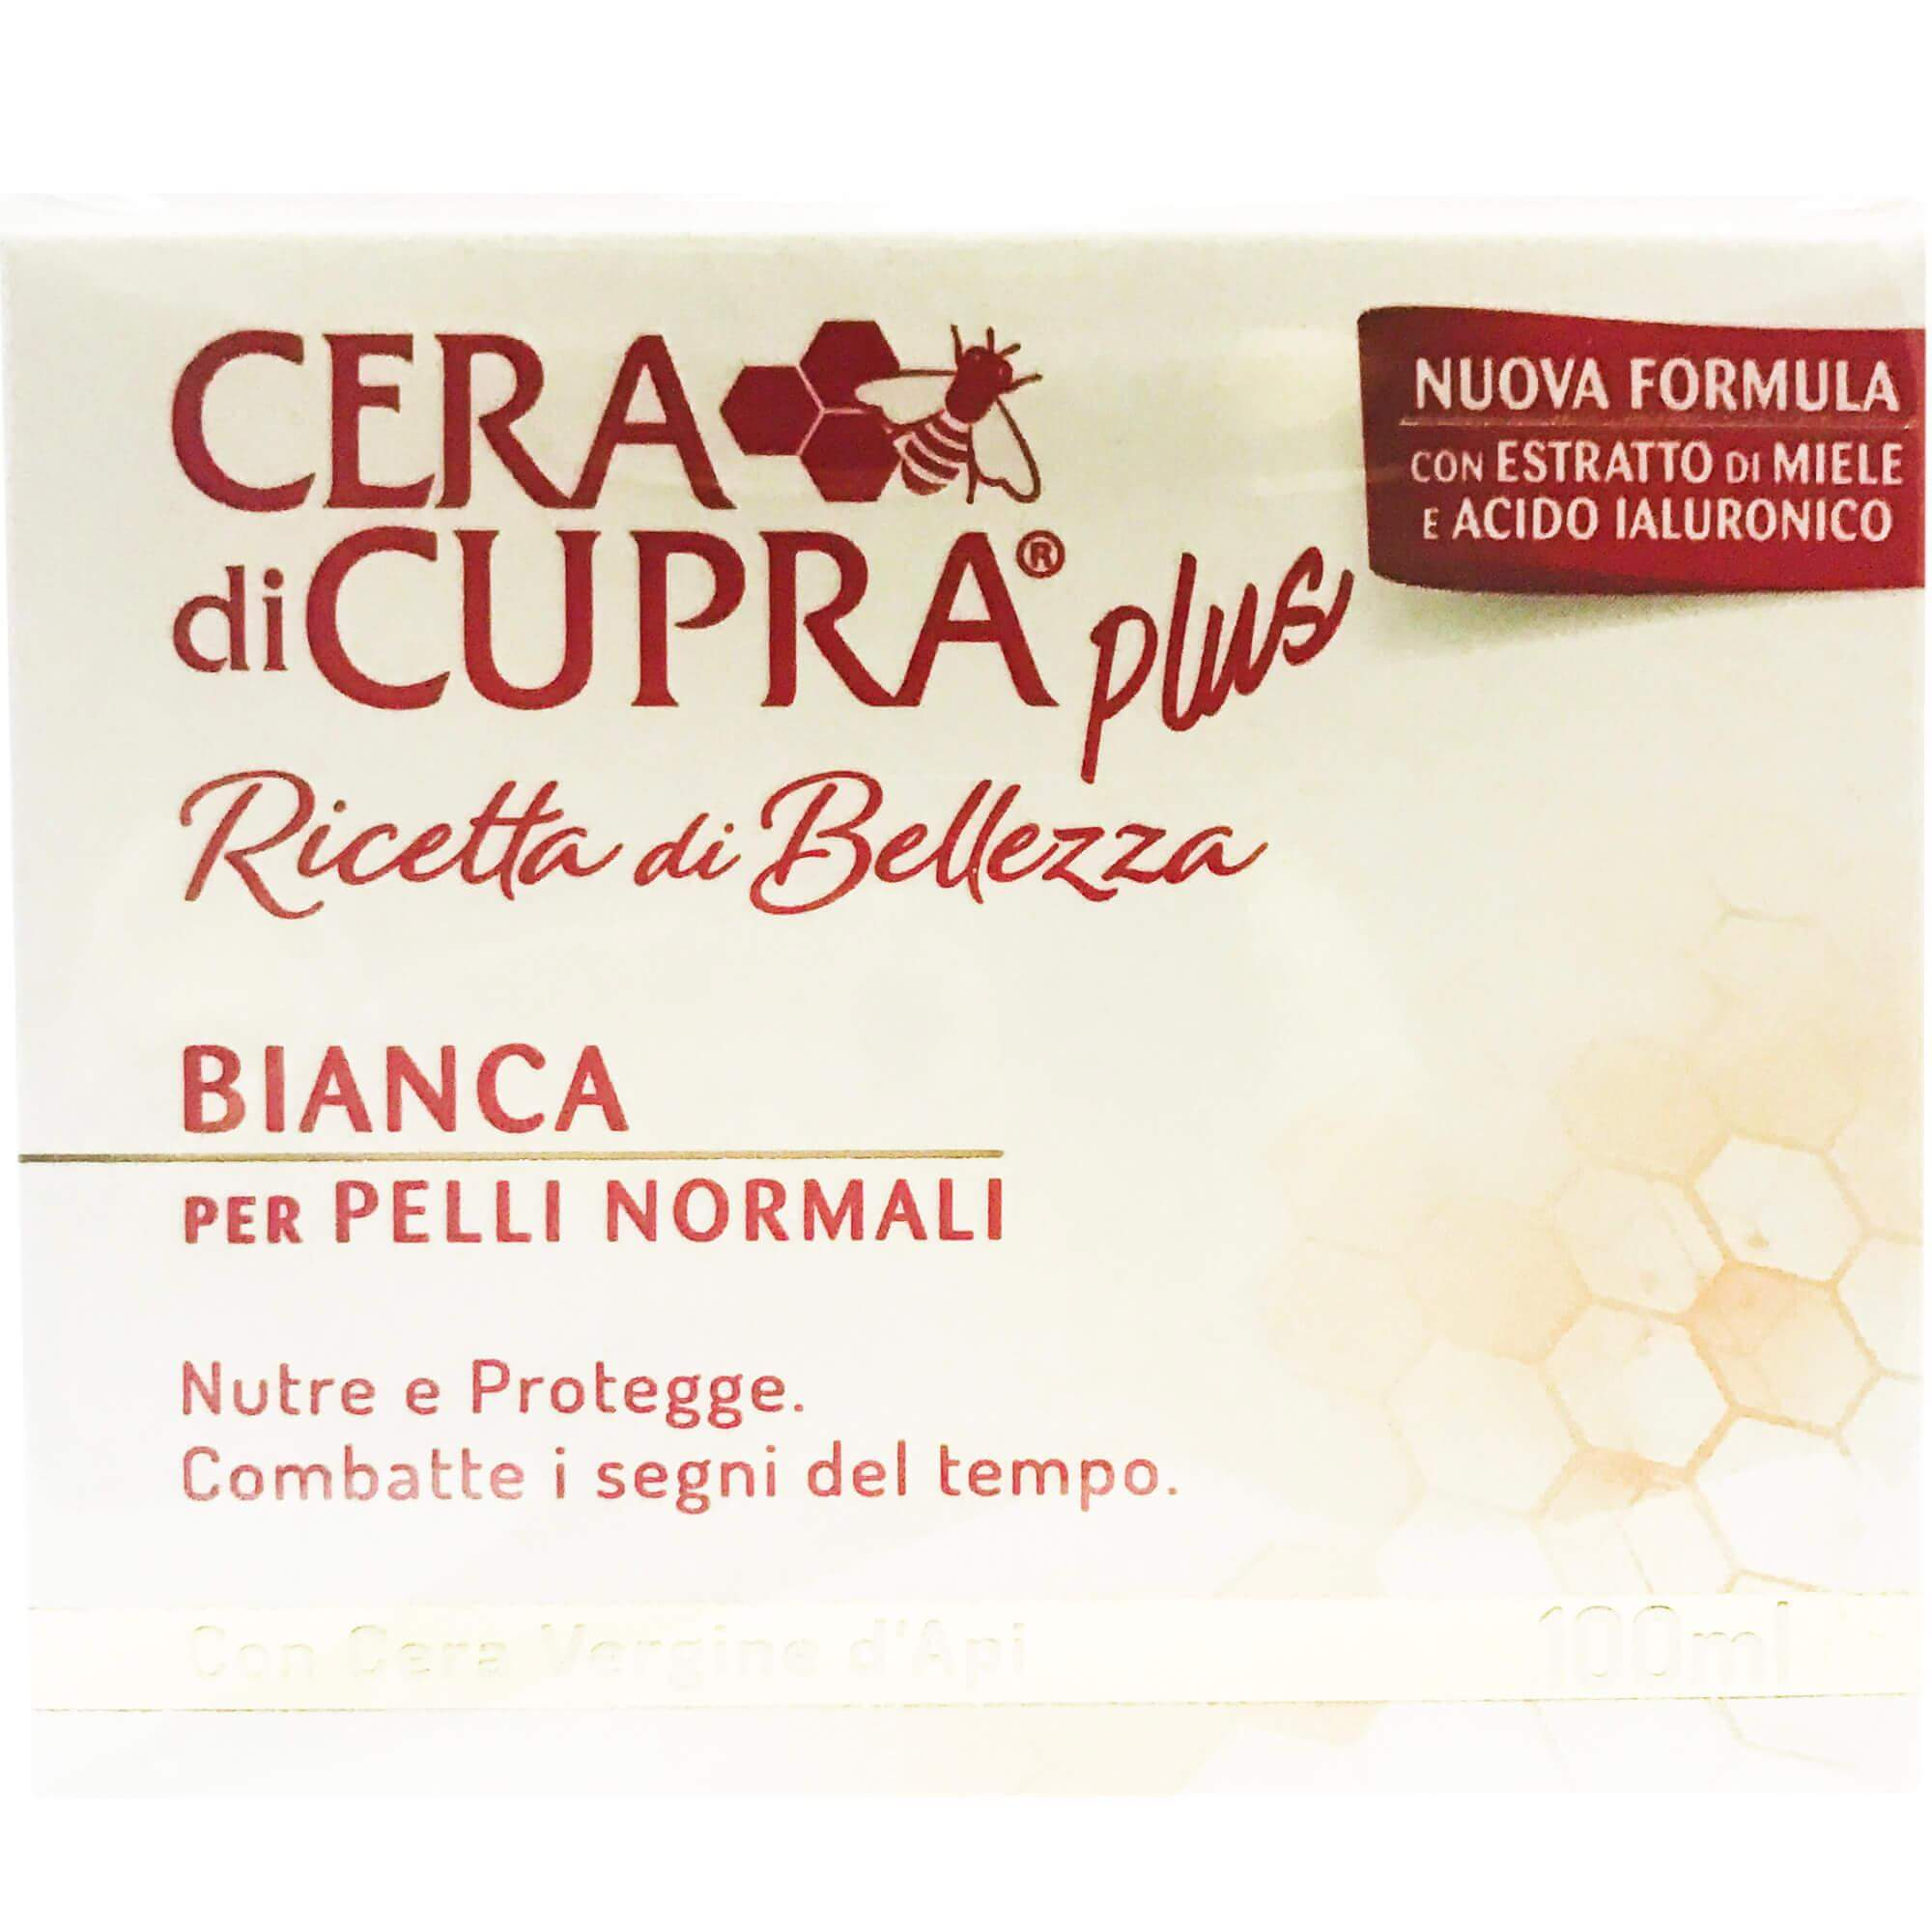 Cera di Cupra Plus Ricetta di Bellezza BiancaΑντιγηραντική, Θρεπτική& Προστατευτική Κρέμαγια Κανονικό Δέρμα100ml